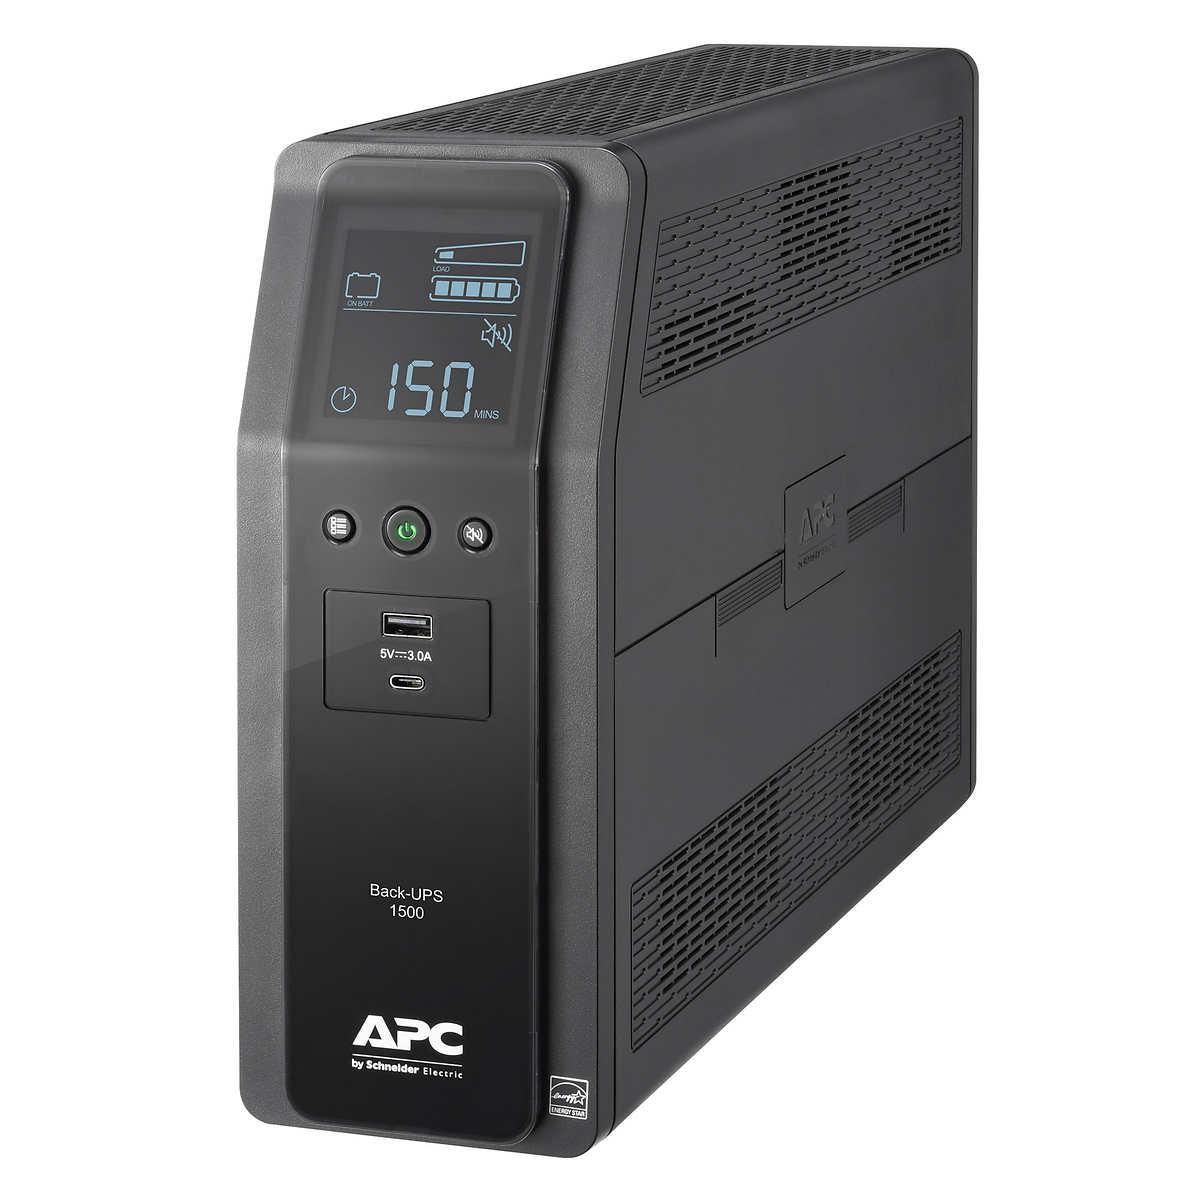 sale retailer aad68 3941c APC Back-UPS Pro 1500 Battery Backup